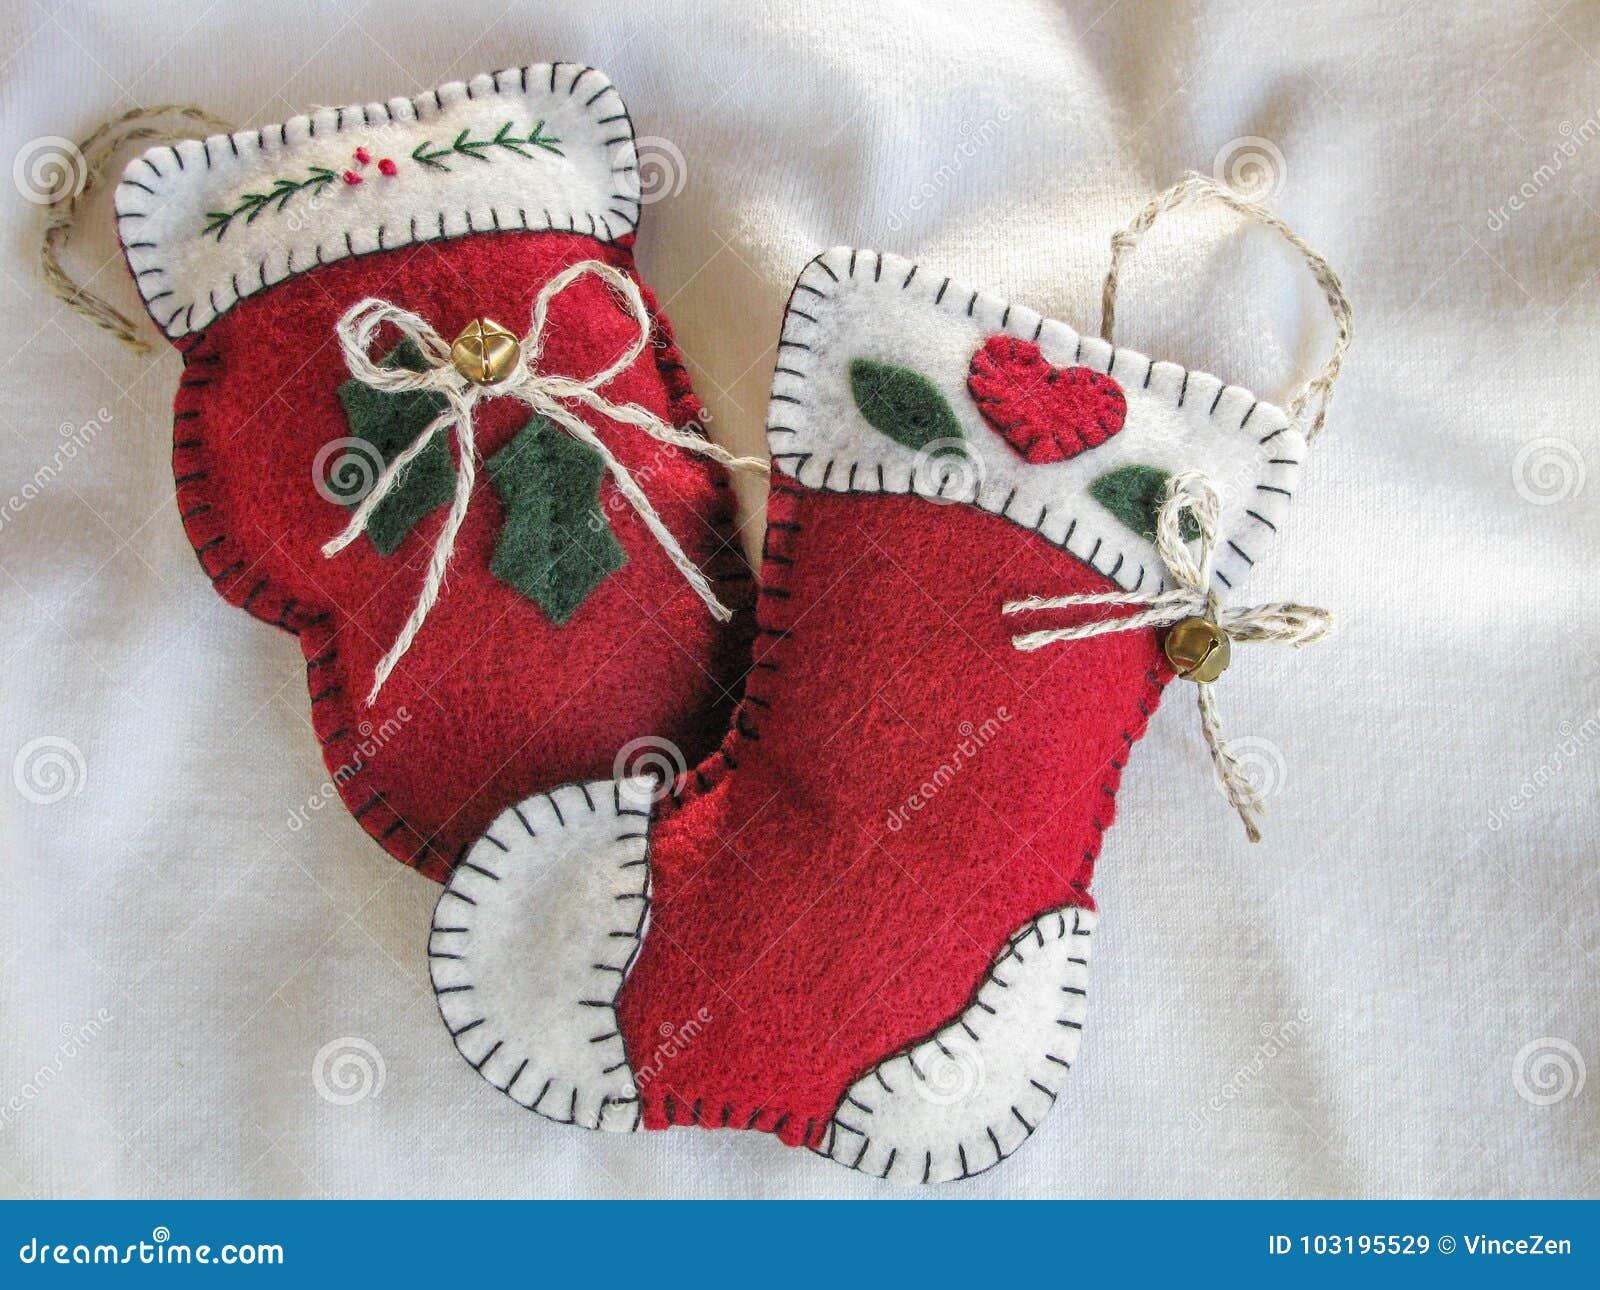 Handmade fabric christmas tree ornaments stock image image of